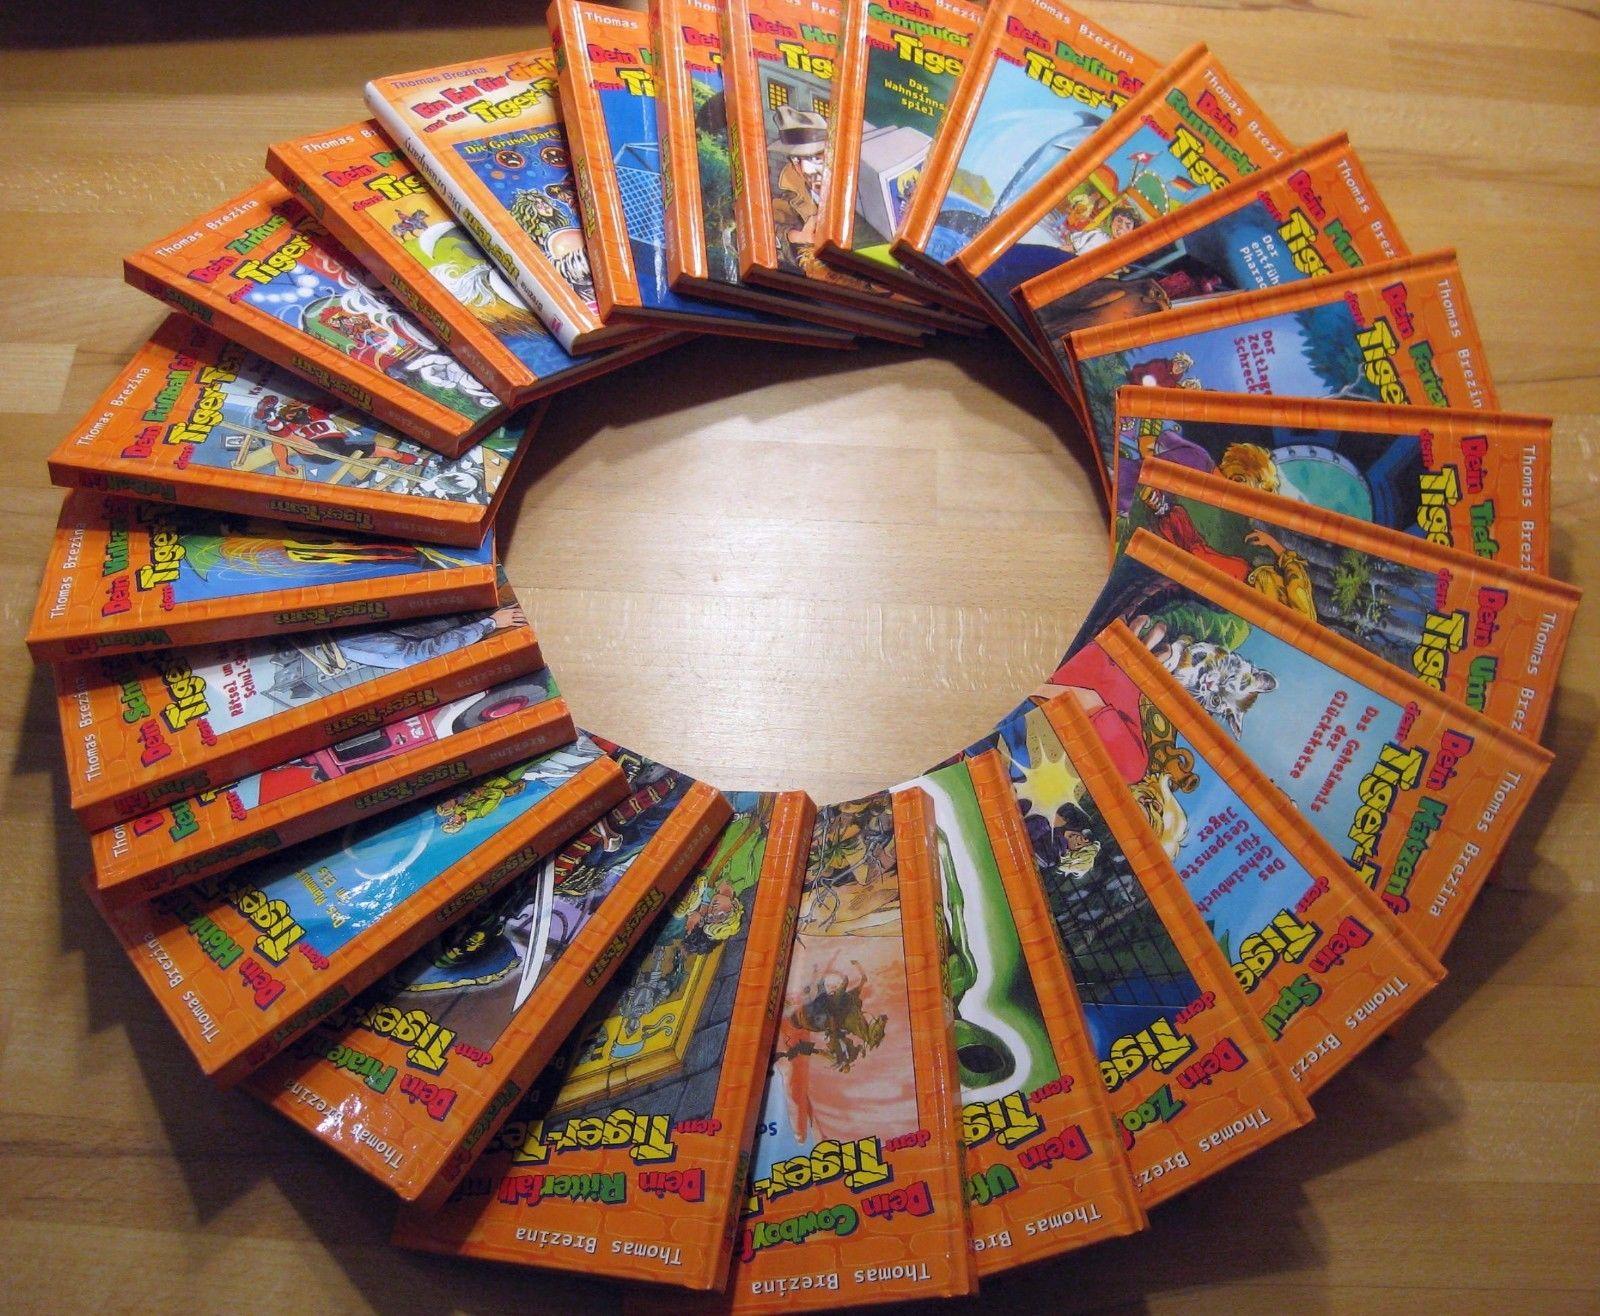 24 Kinderbücher Tiger-Team ( Thomas Brezina ) Bücher-Sammlung Set